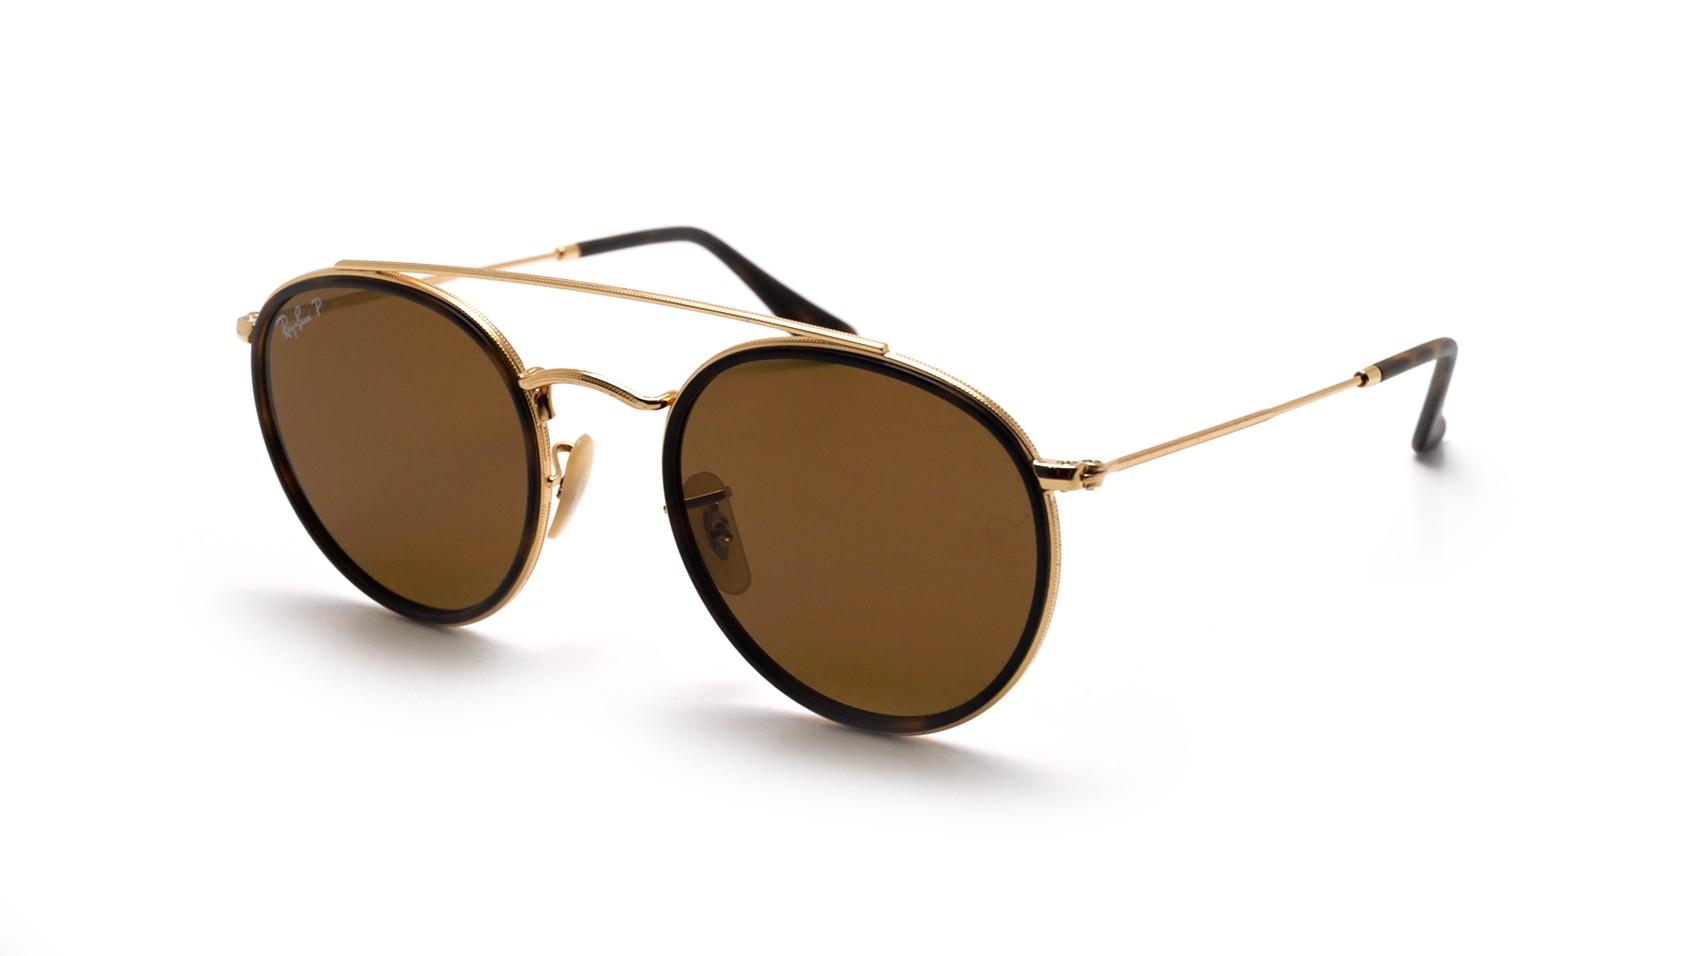 5740c9e467a203 Sunglasses Ray-Ban Round Double Bridge Gold RB3647N 001 57 51-22 Medium  Polarized